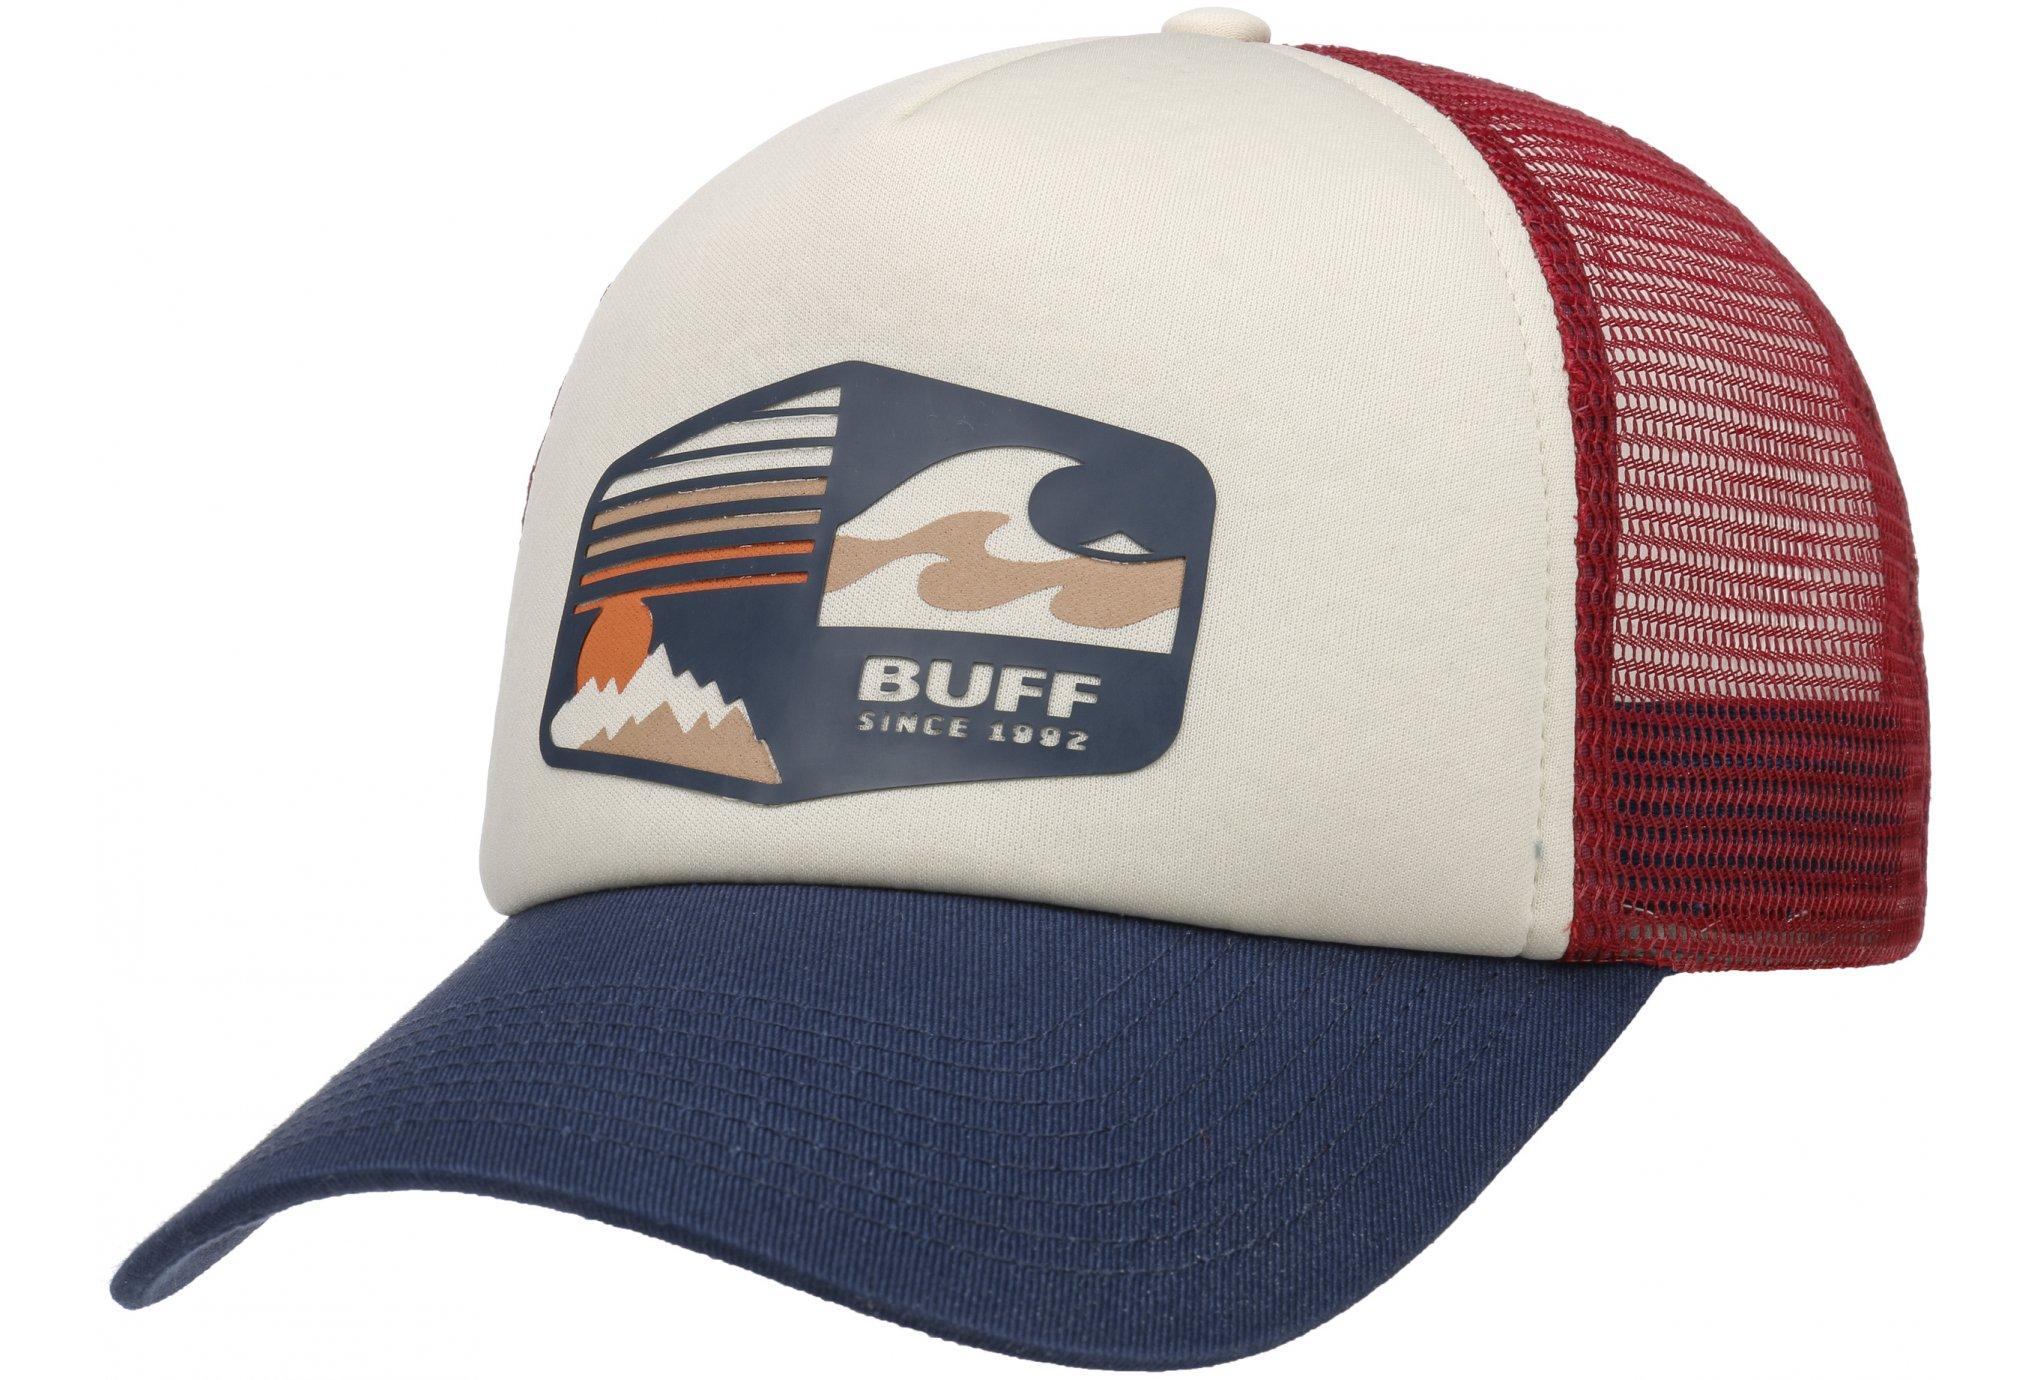 Buff Trucker Cap Jari Multi Casquettes / bandeaux